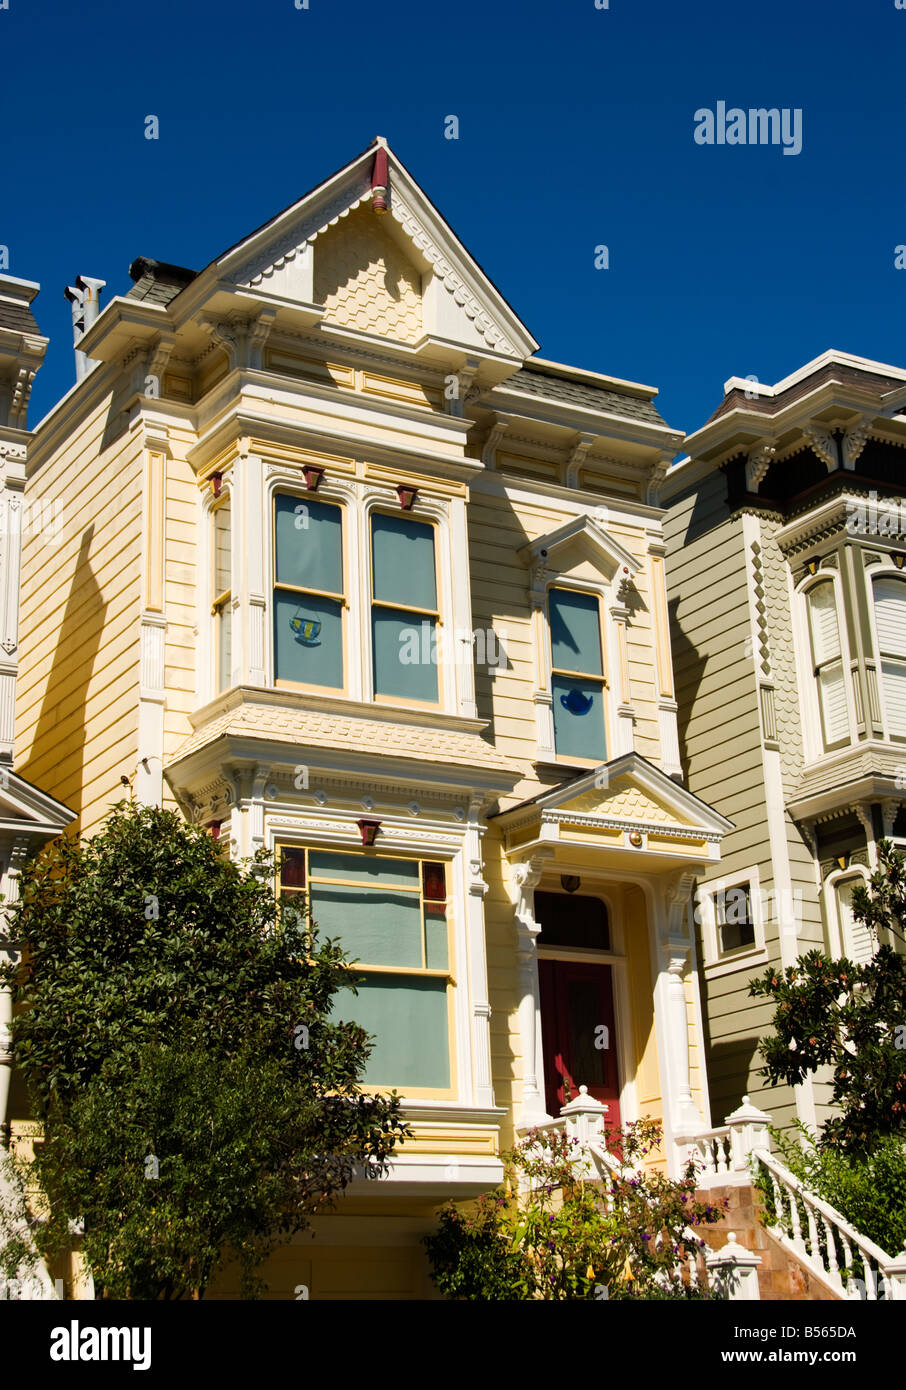 California San Francisco Lovely yellow Victorian House near Laguna and Bush Streets. - Stock Image